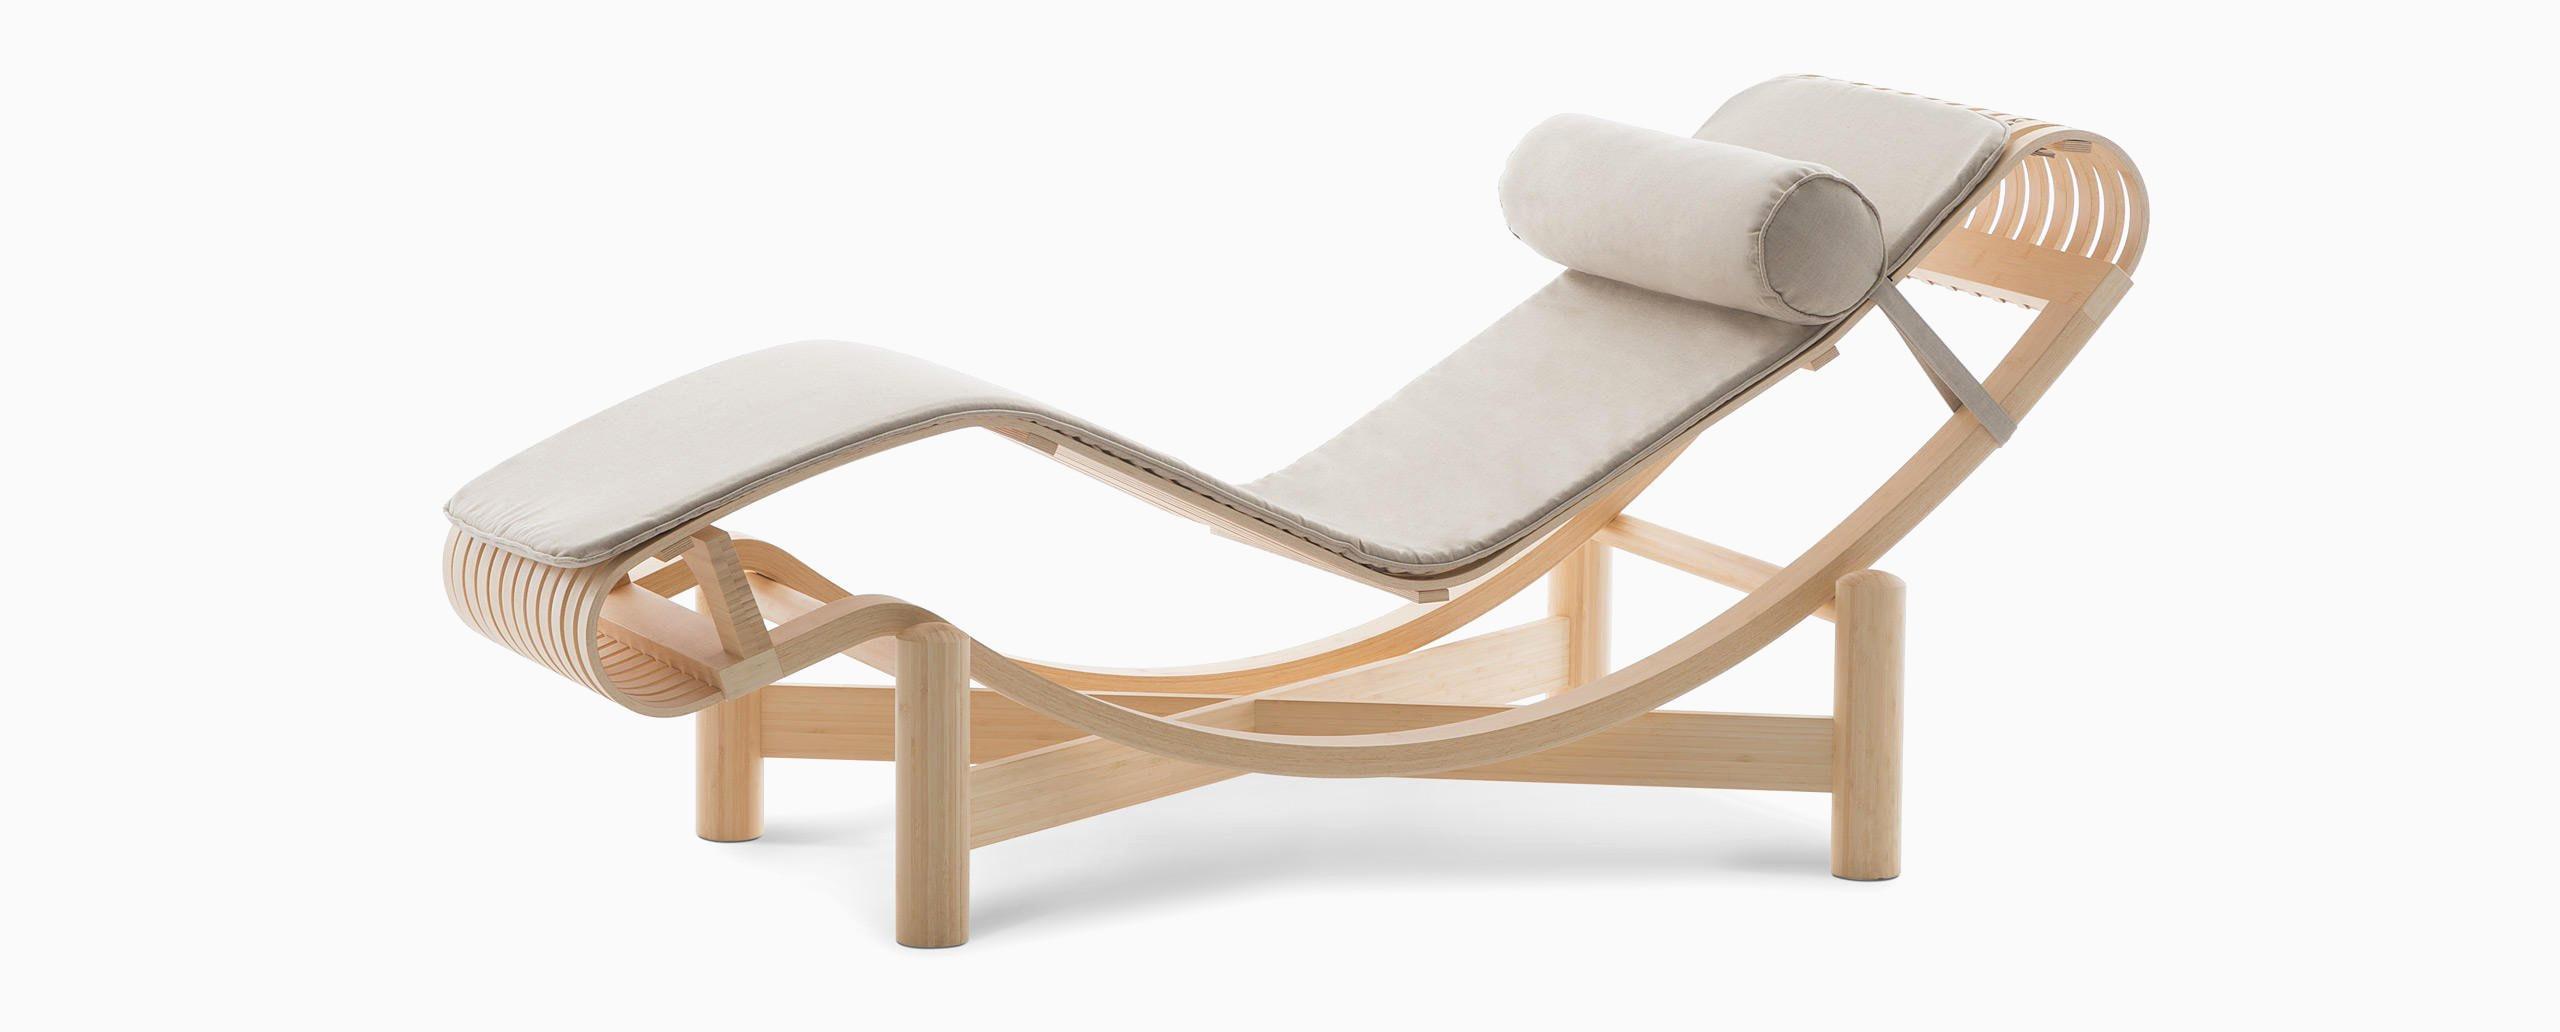 chaise longue basculante de jardin singulier chaise longue bambou des chaise longue basculante de jardin